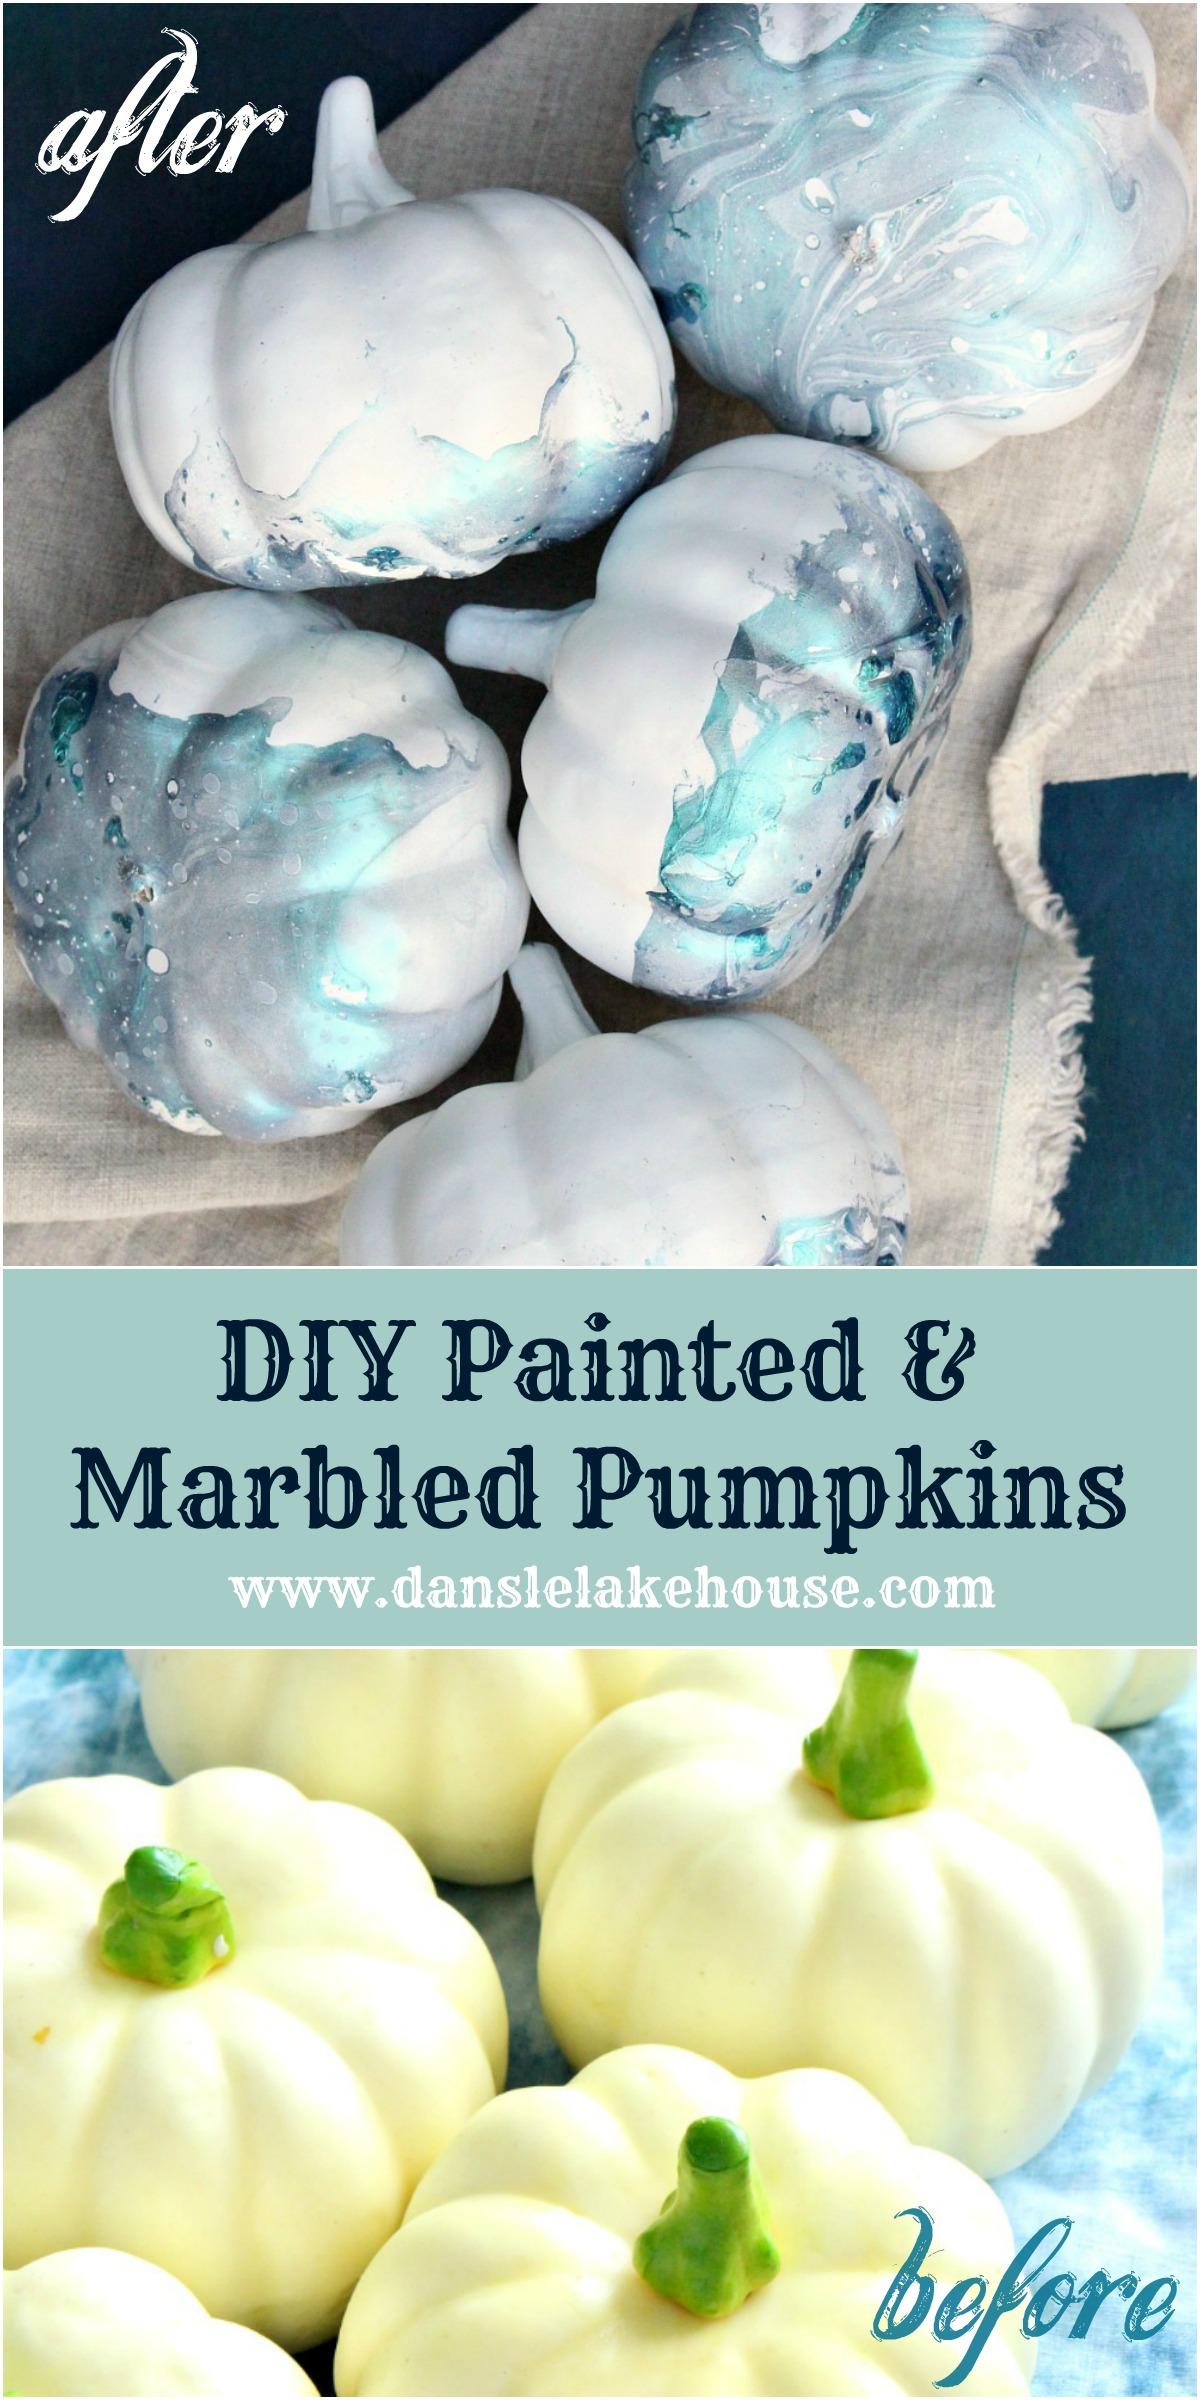 DIY painted and marbled pumpkins